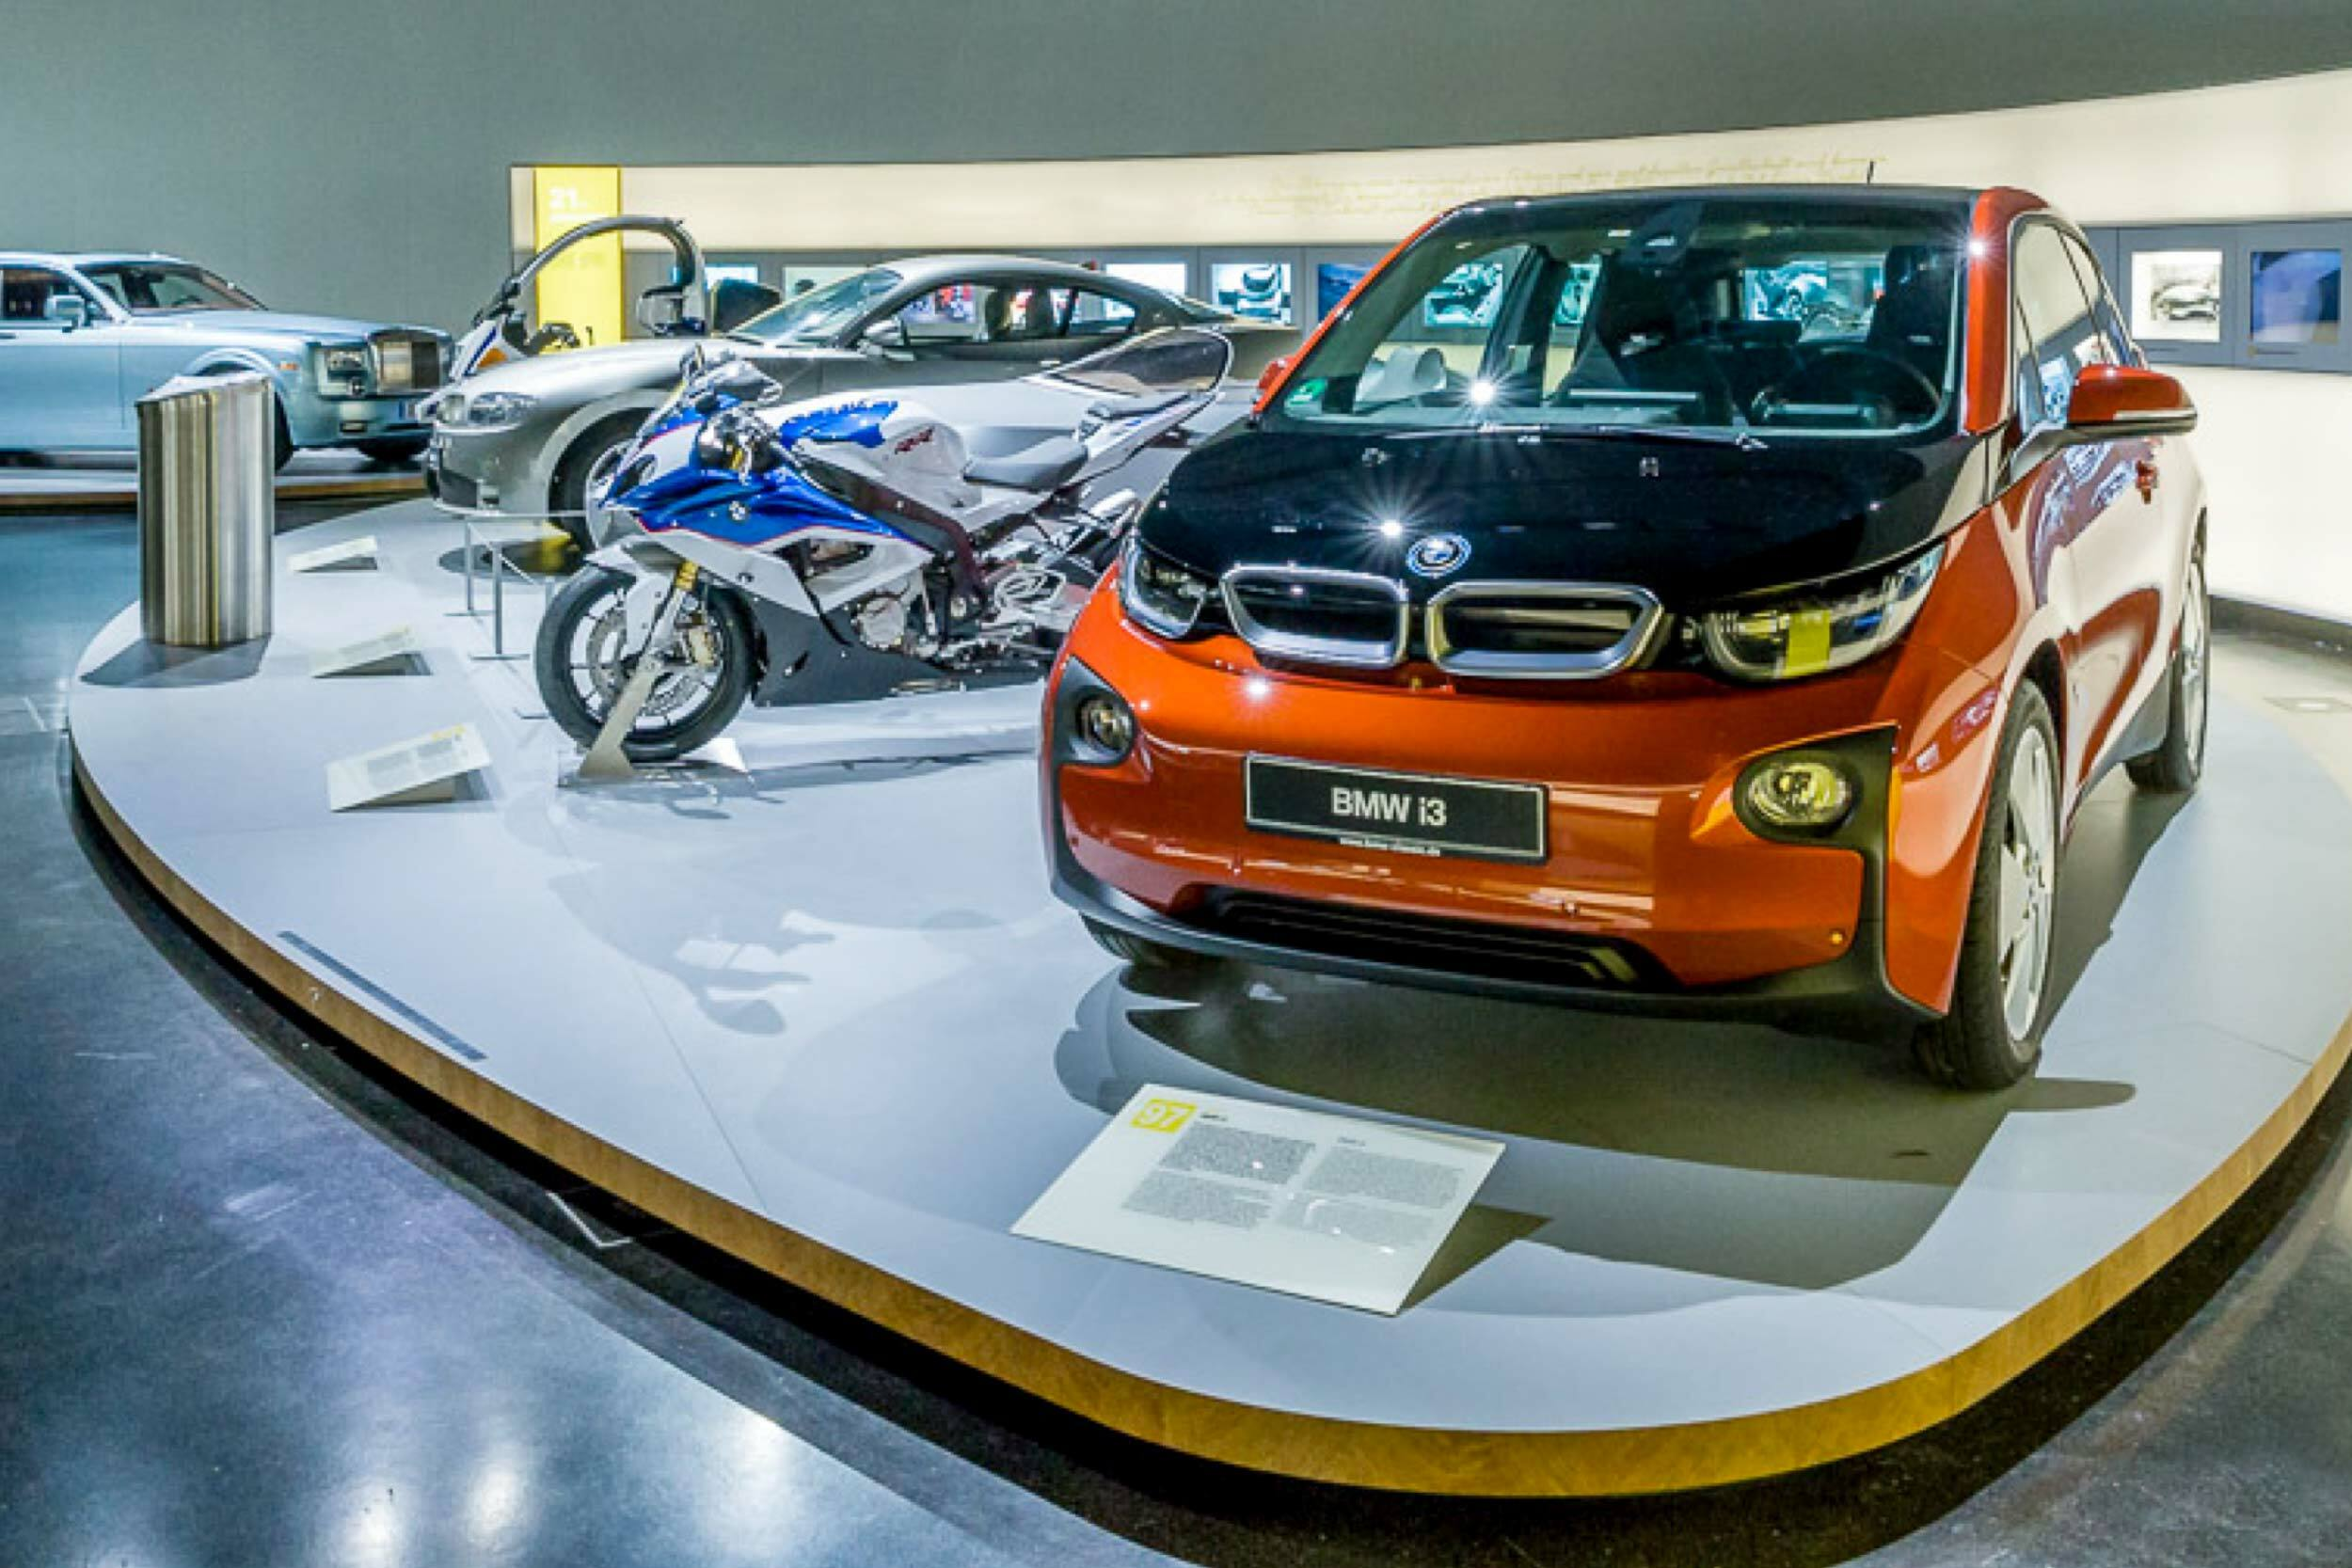 Ein BMW i3 Exponat im BMW Museum